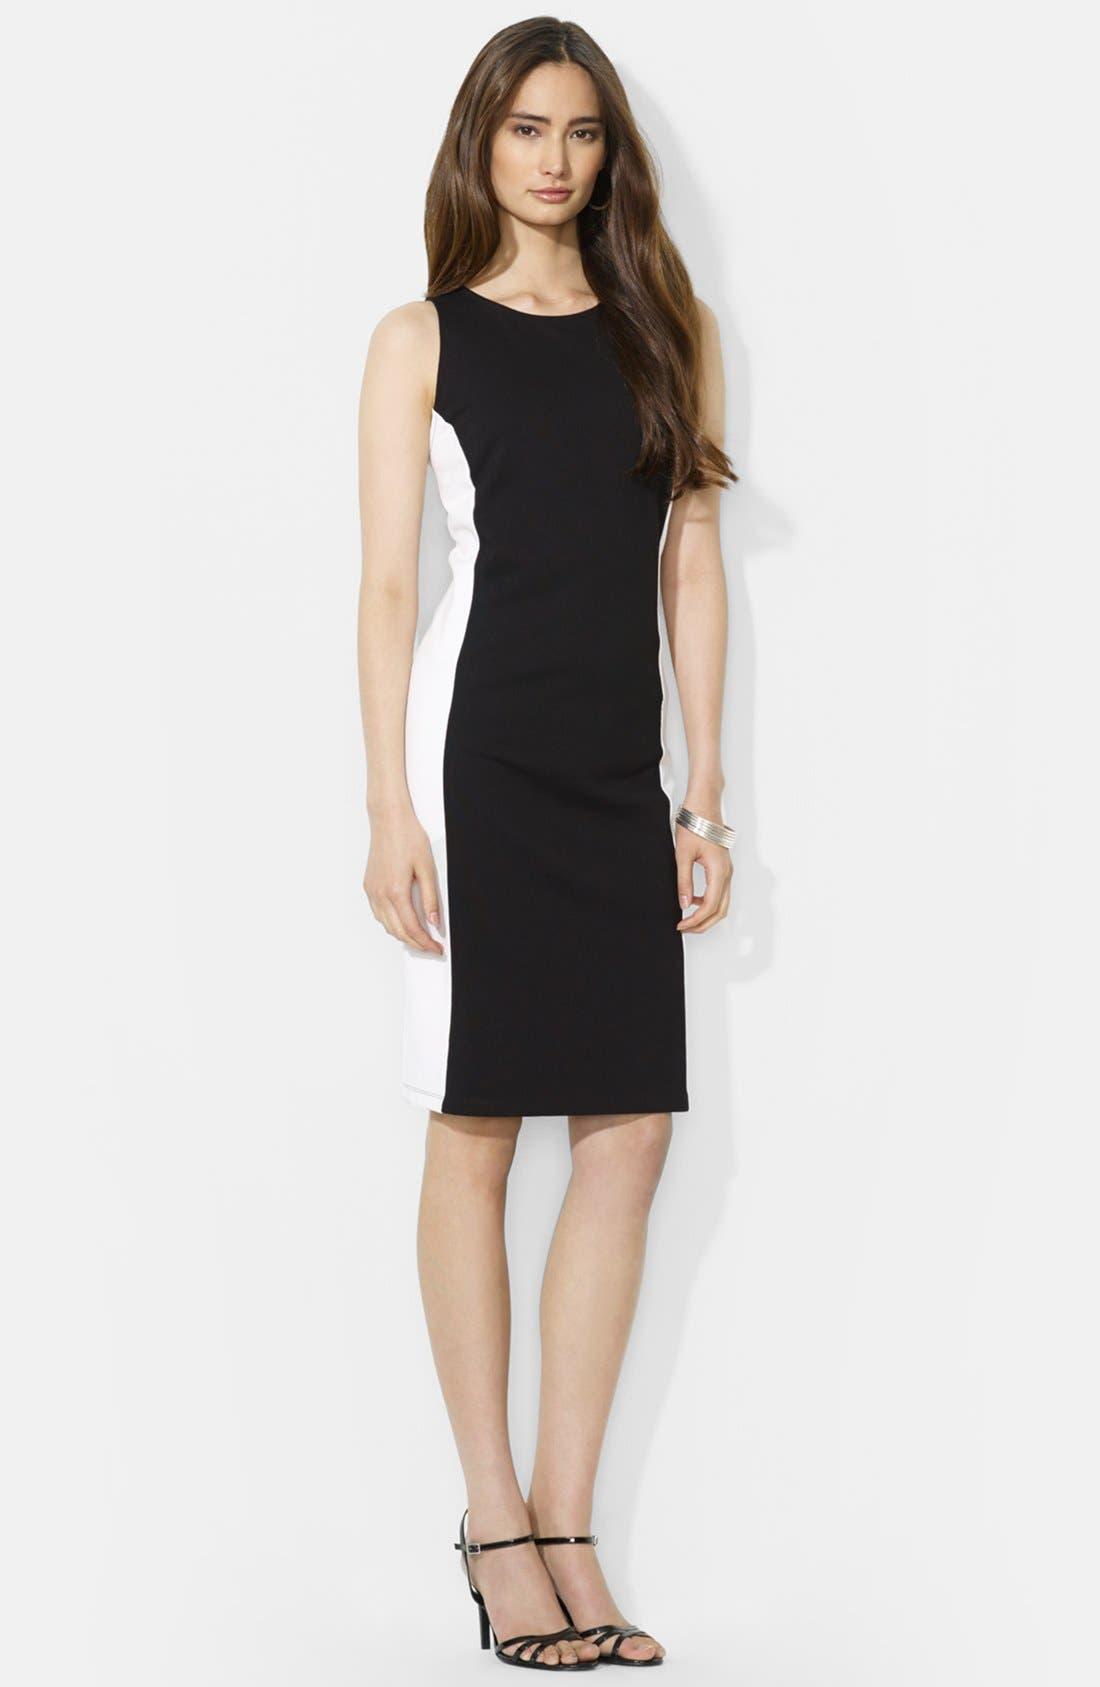 Alternate Image 1 Selected - Lauren Ralph Lauren Colorblock Sleeveless Ponte Dress (Petite)